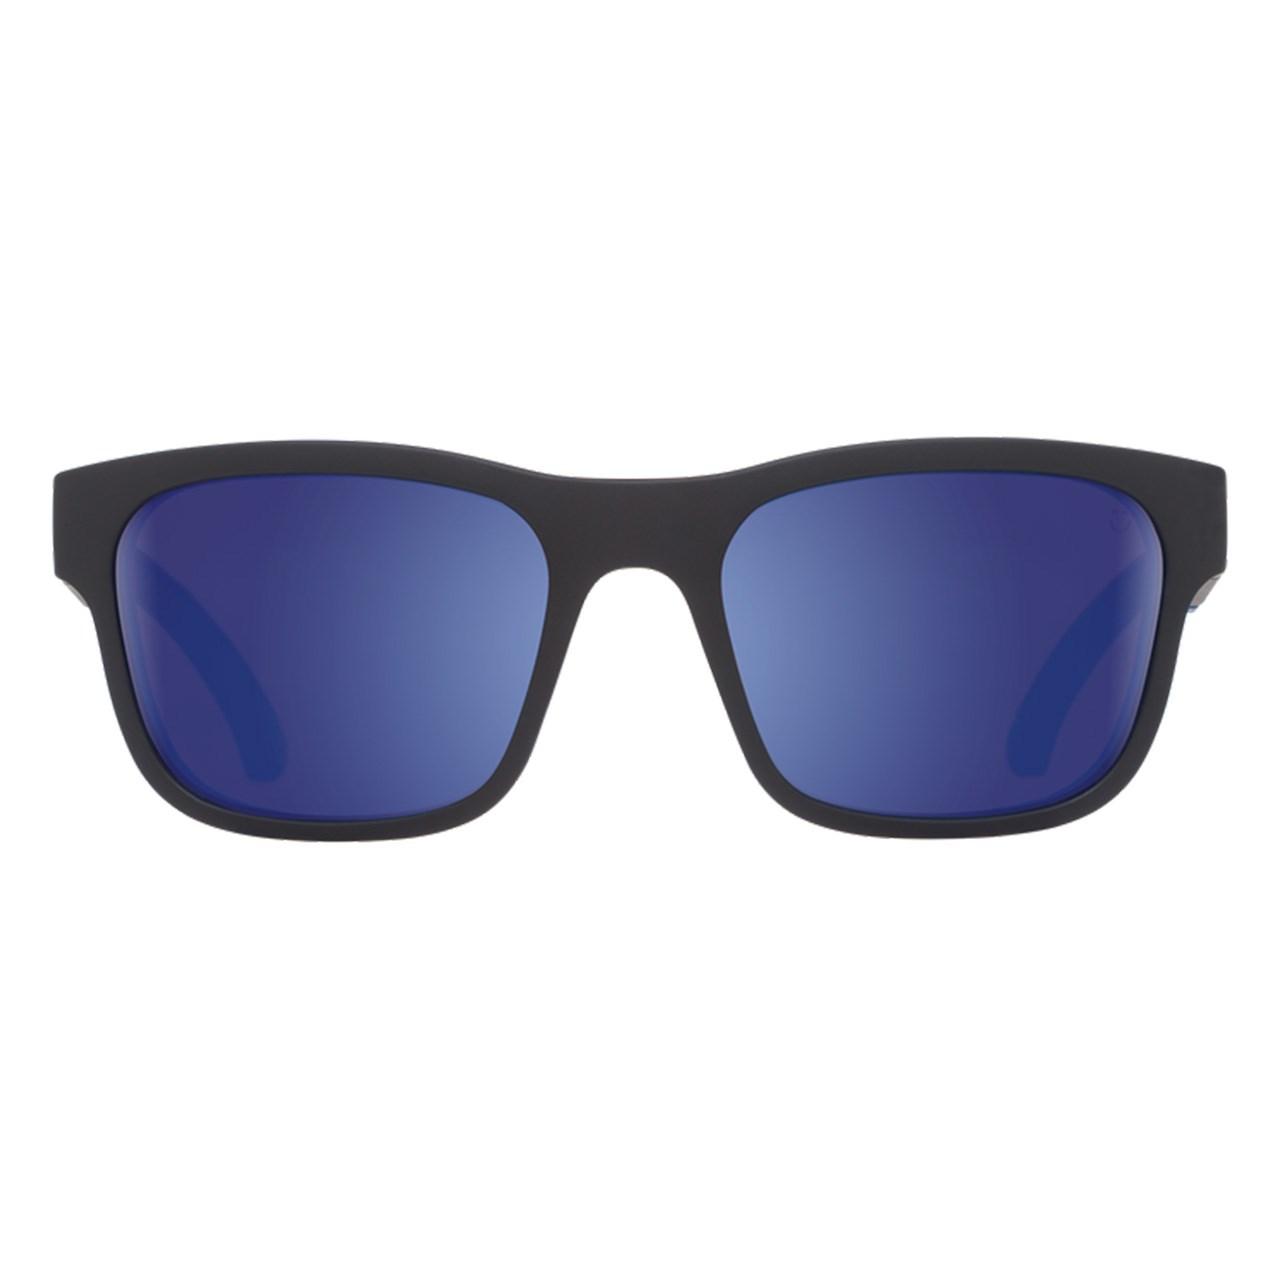 عینک آفتابی اسپای سری Hunt مدل Matte Black Navy Happy Bronze Polar Dark Blue Spectra